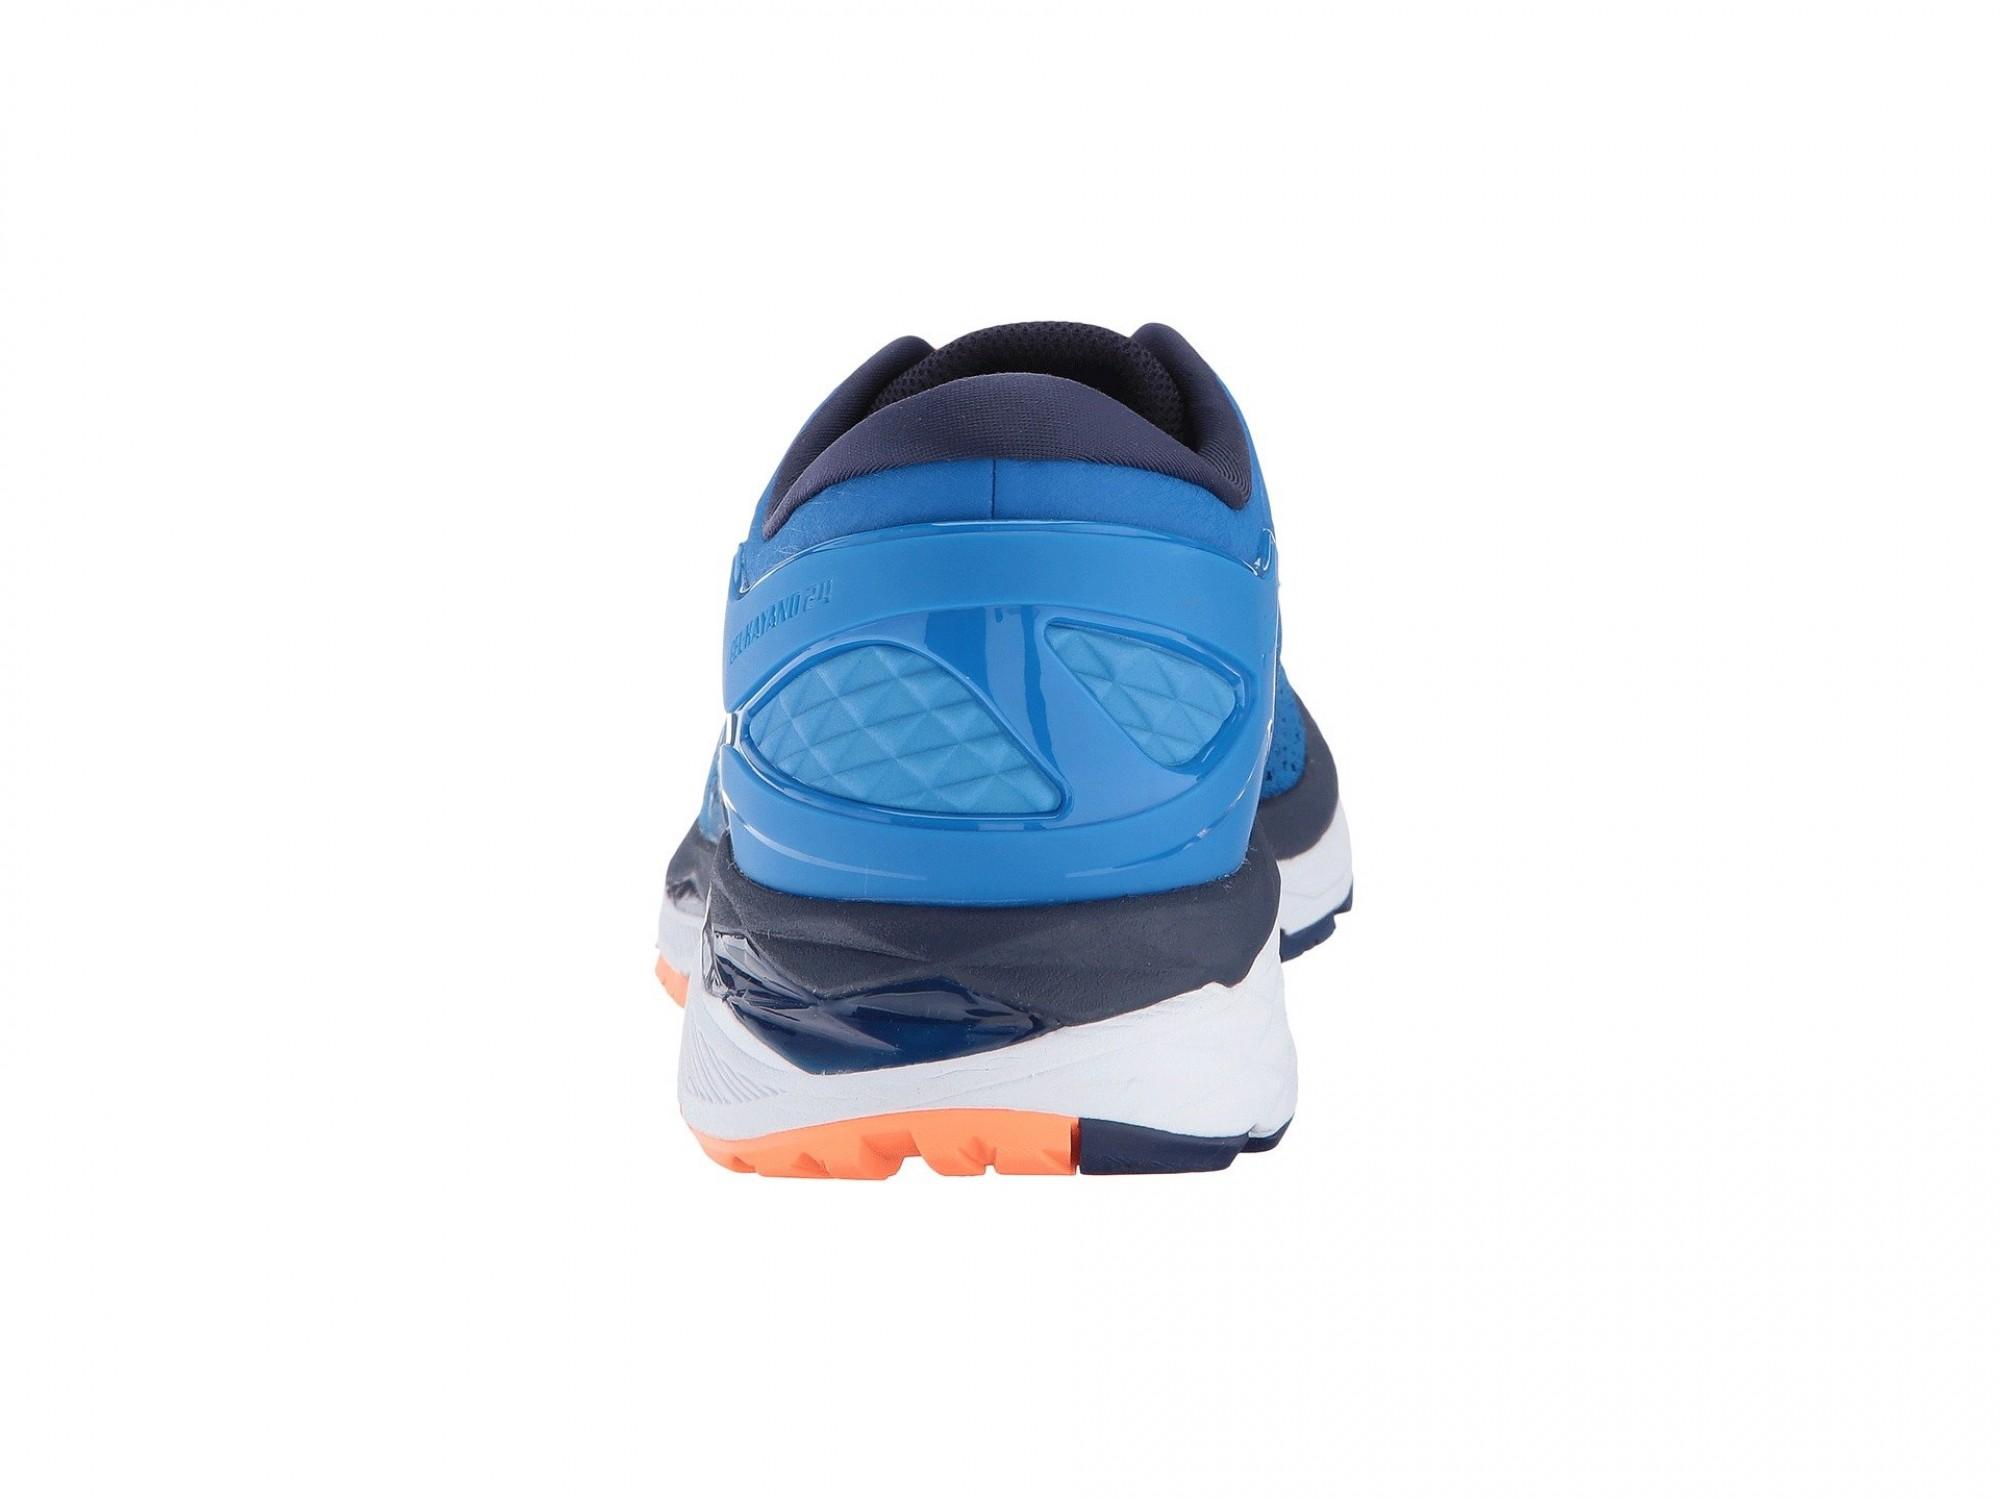 ASICS Gel Kayano 24 (Bleu Directoire 4358/ Crayon// Directoire Orange Chaud) T749N 4358 894129d - deltaportal.info